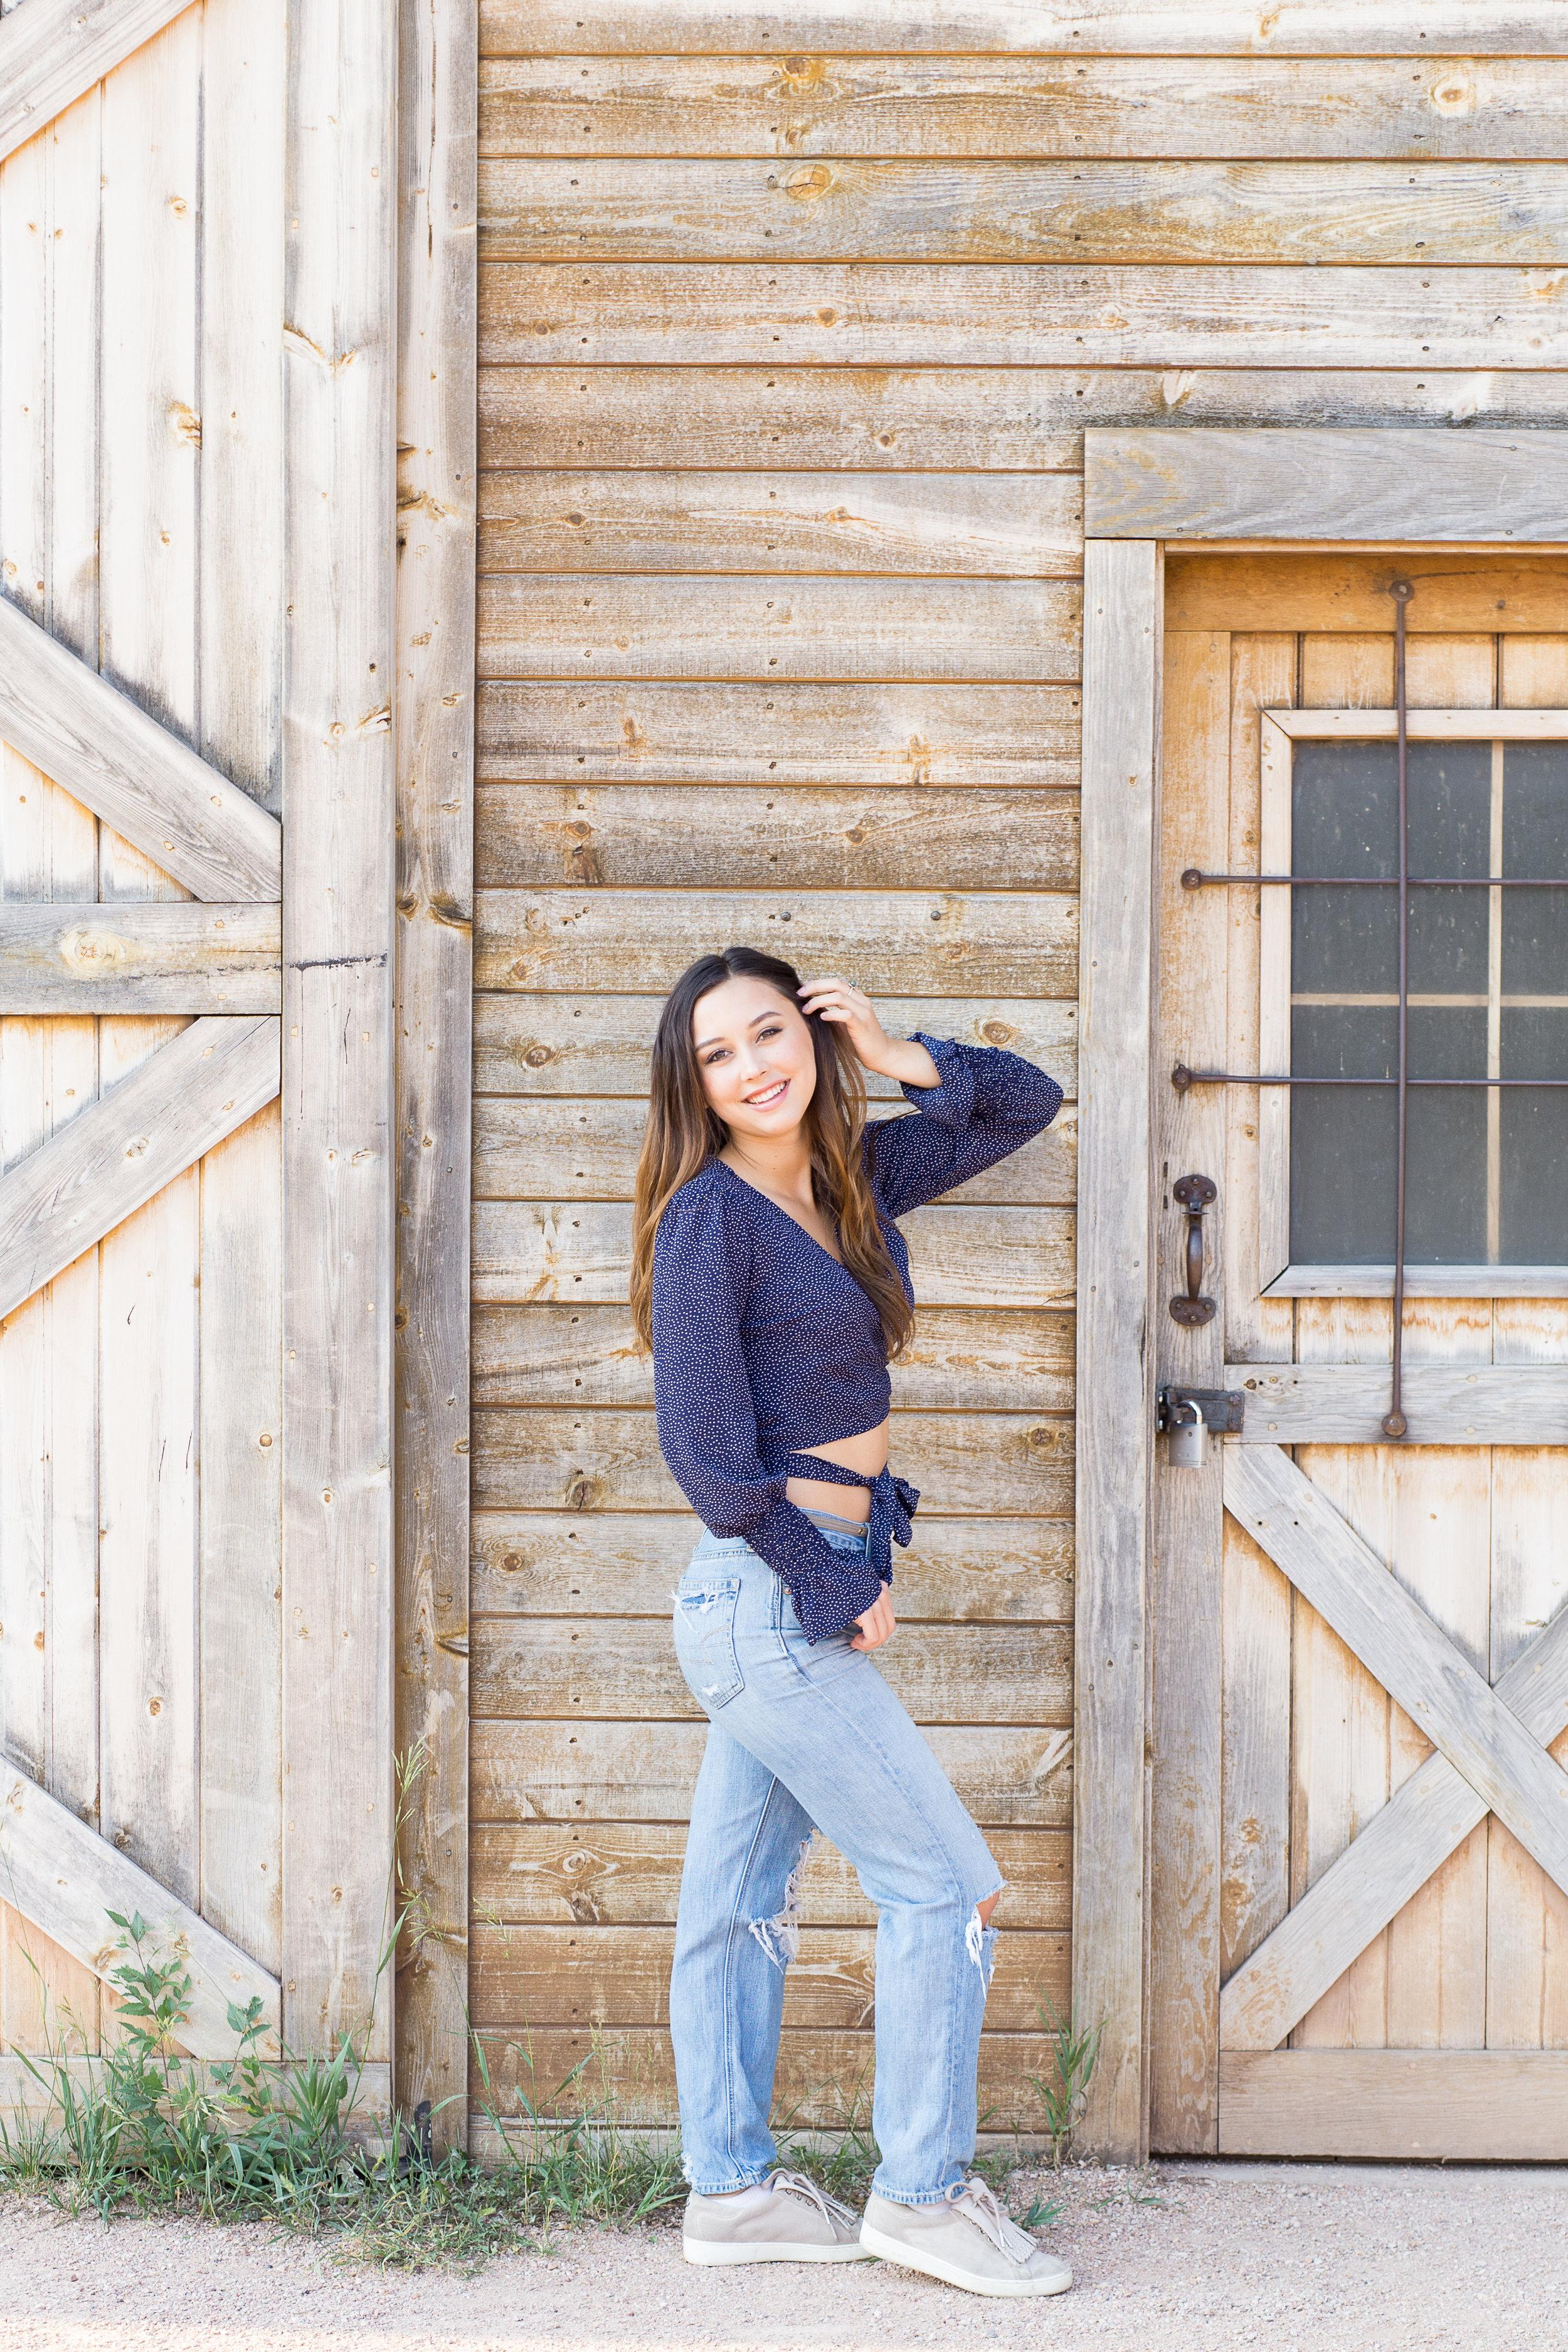 Colorado Springs Senior Photographer | Stacy Carosa Photography | Colorado Springs Senior Photography | Denver Senior Photography | Cheyenne Mountain High School